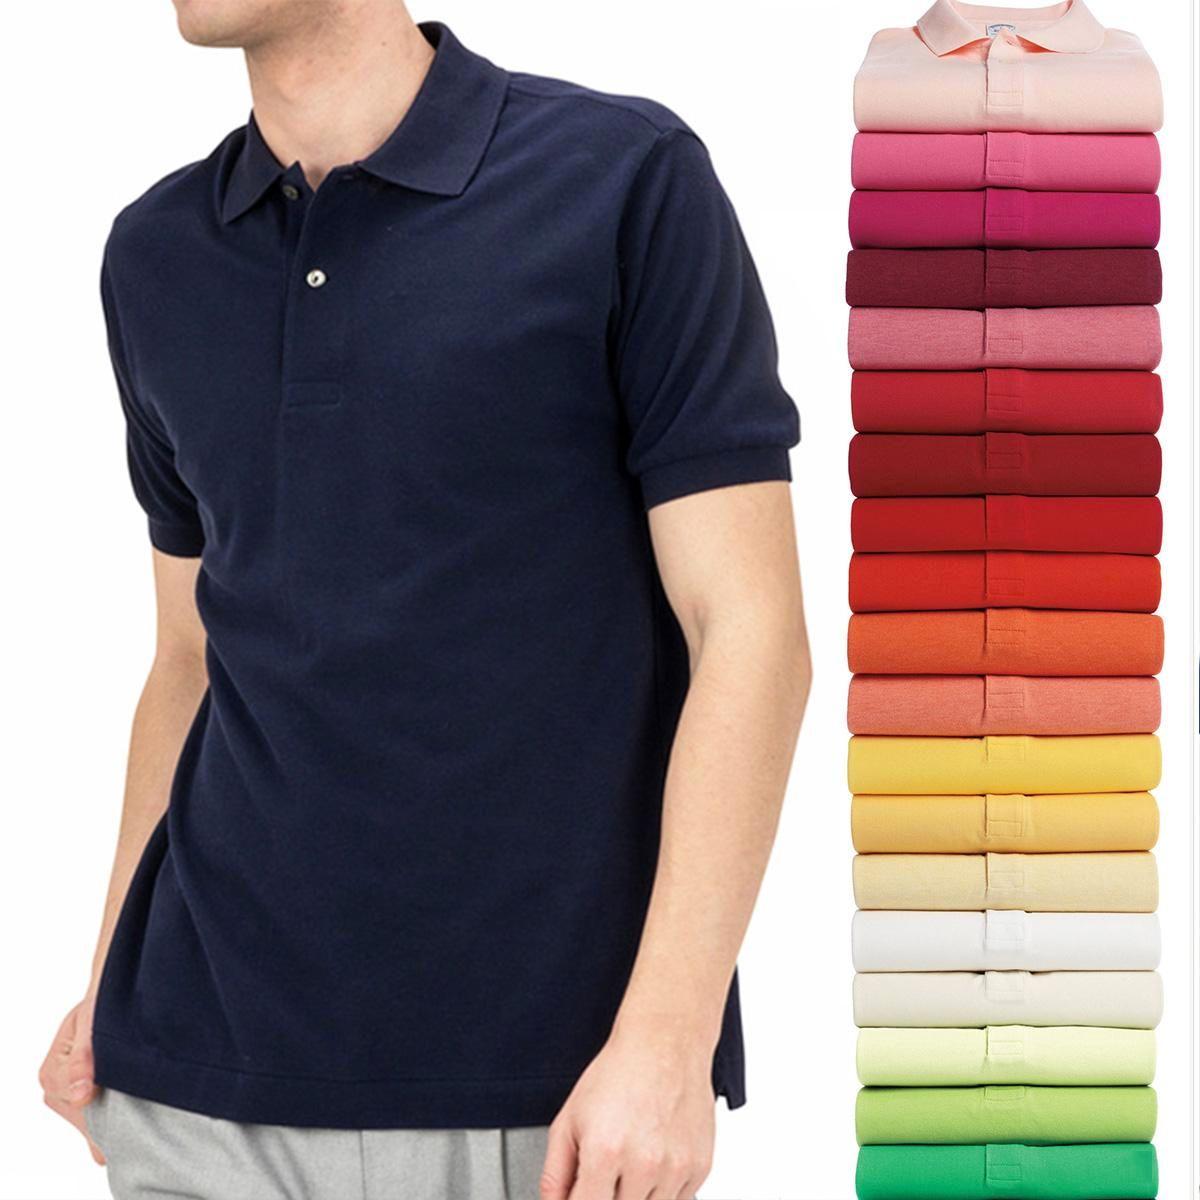 men polos summer designer t shirts for men Brand men fabric letter polo t-shirt collar casual t-shirt tee shirt tops polo brand